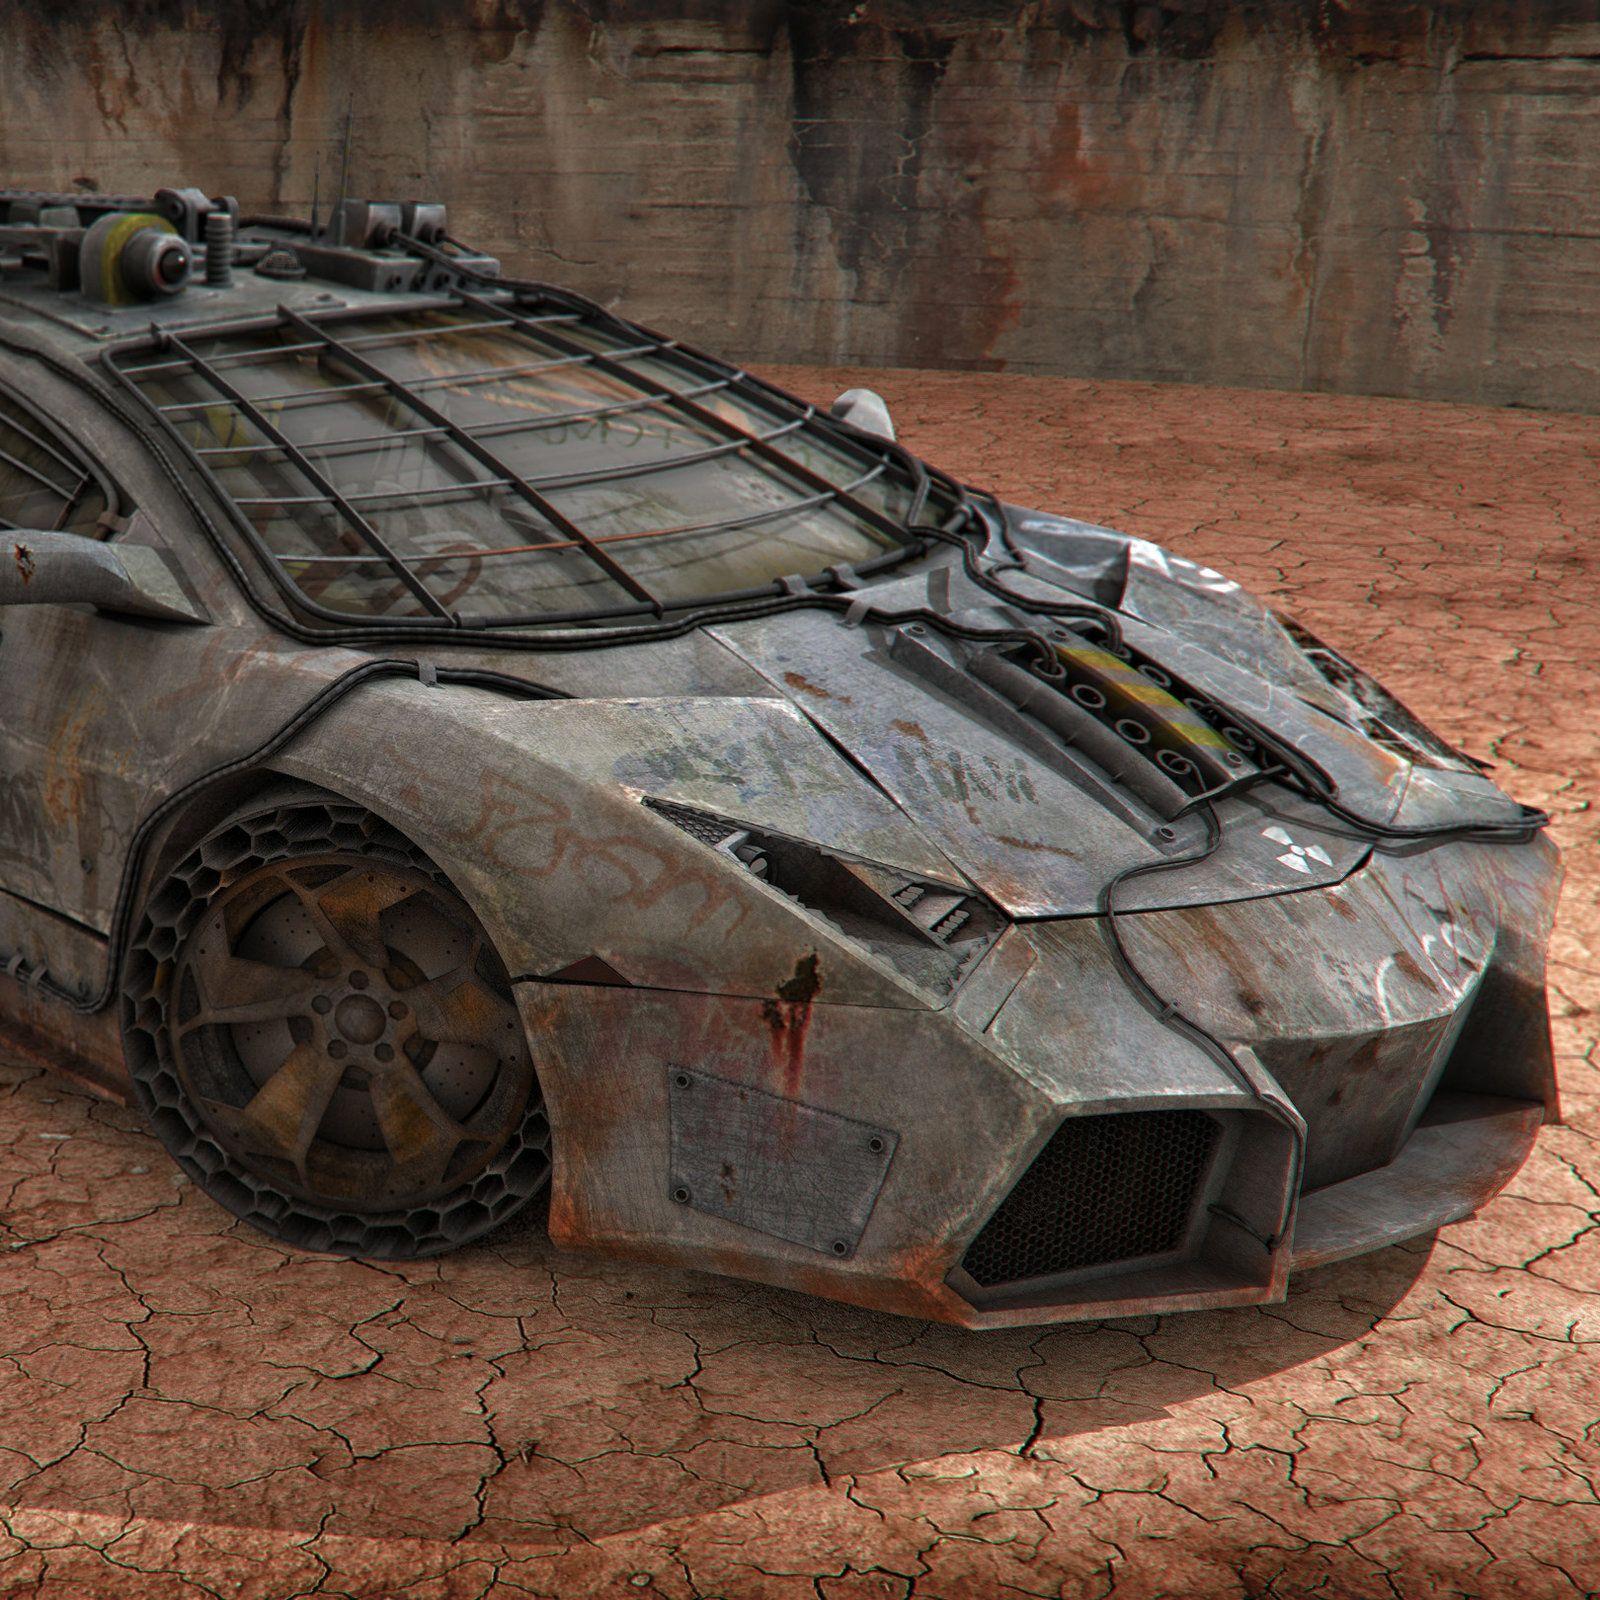 Bon Lamborghini Reventon Nuclear Edition, Vladimir Petkovic On ArtStation At  Https://www.